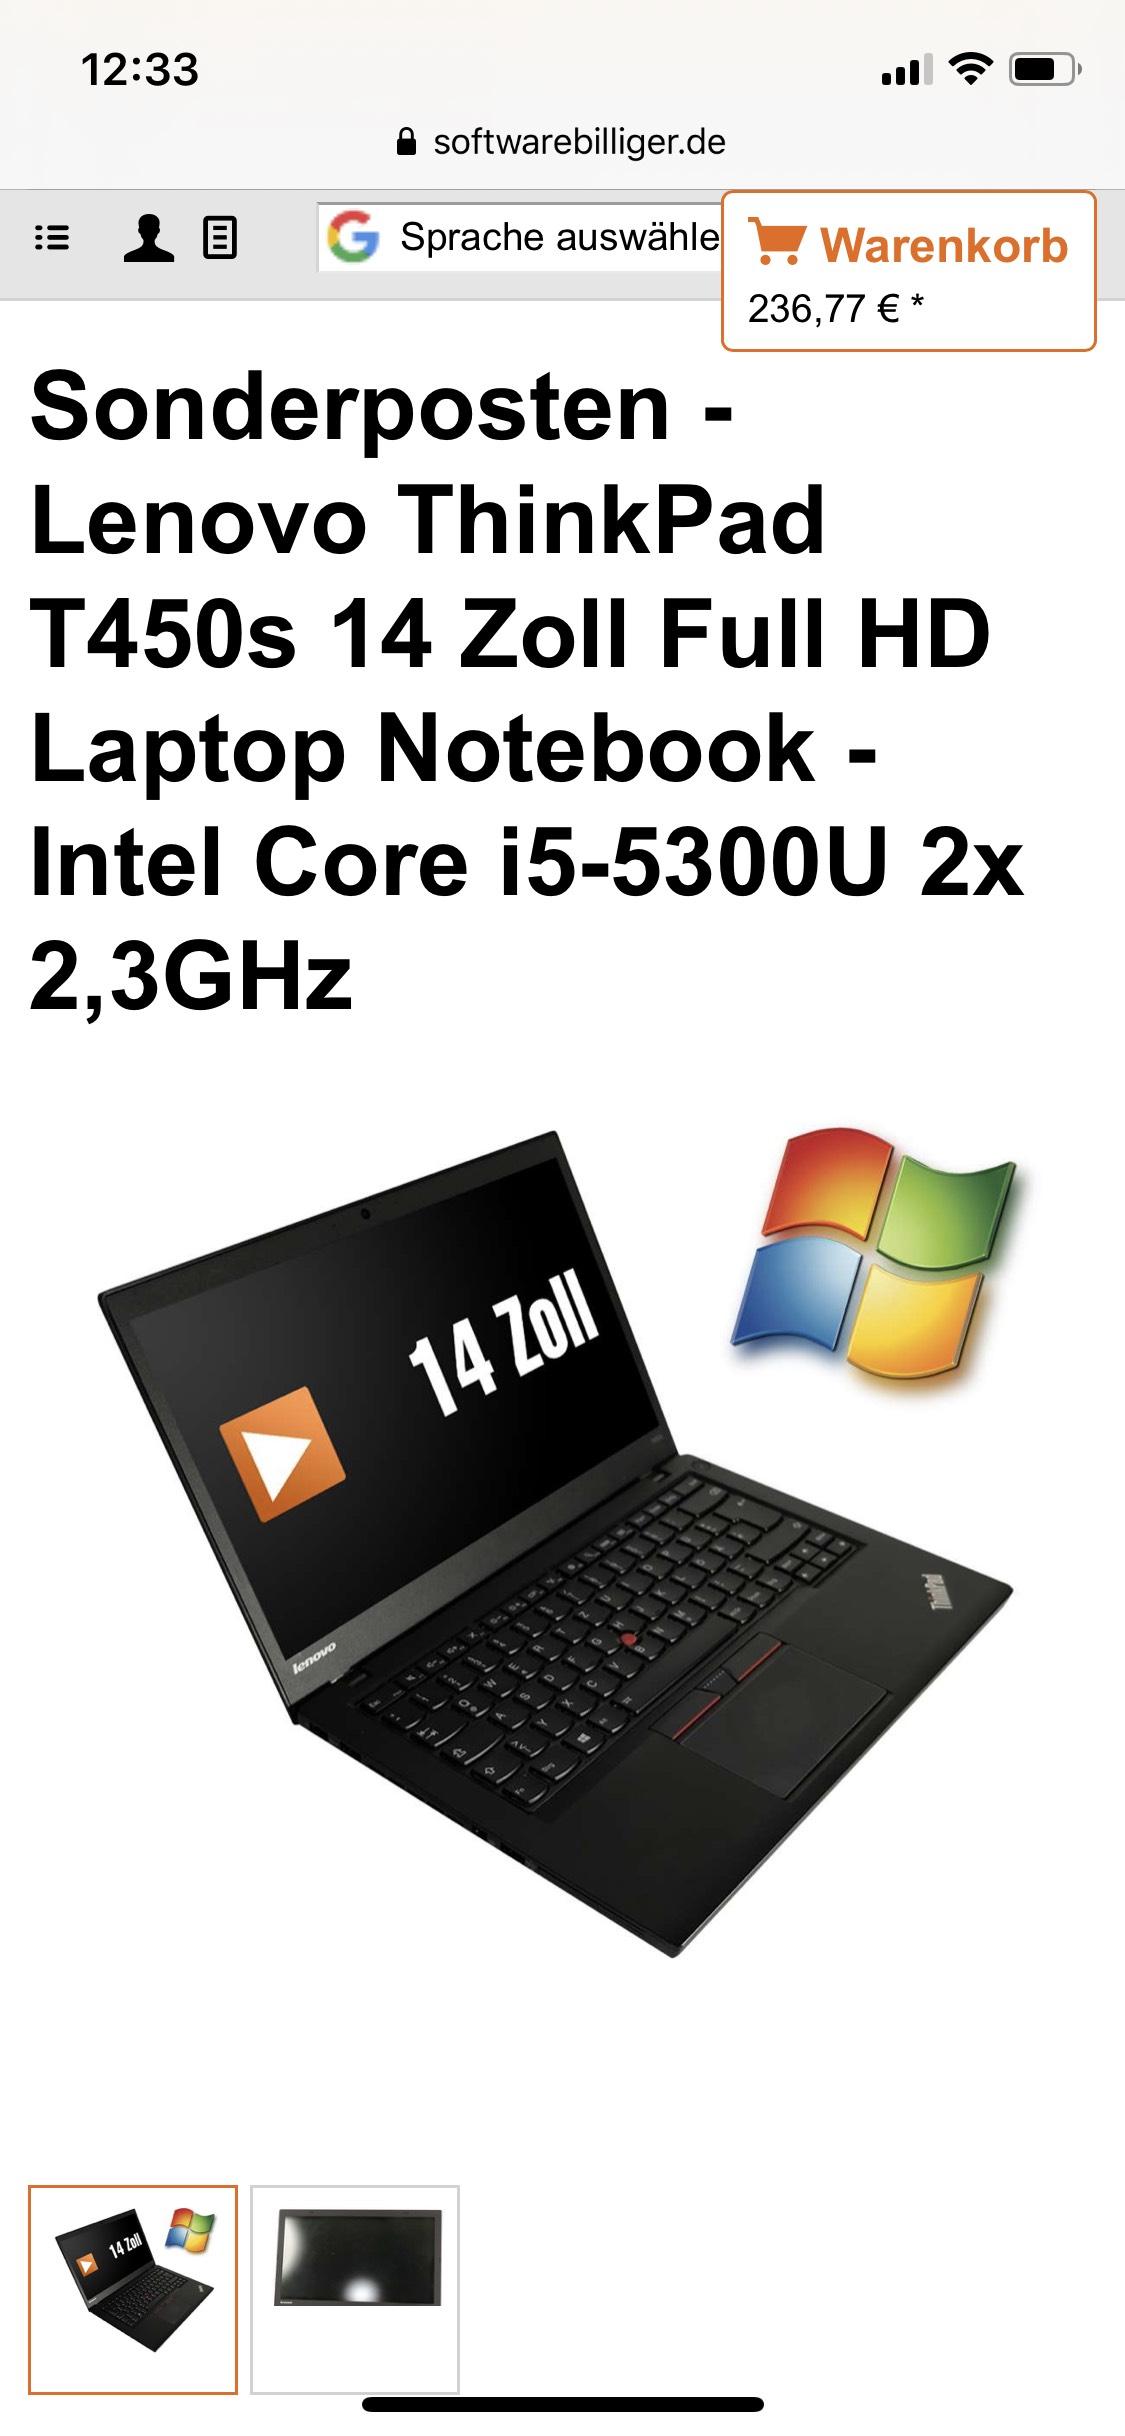 LENOVO T450s ULTRABOOK FULL HD i5 5te Gen 2,3GHz 8GB 256GB SSD B WARE